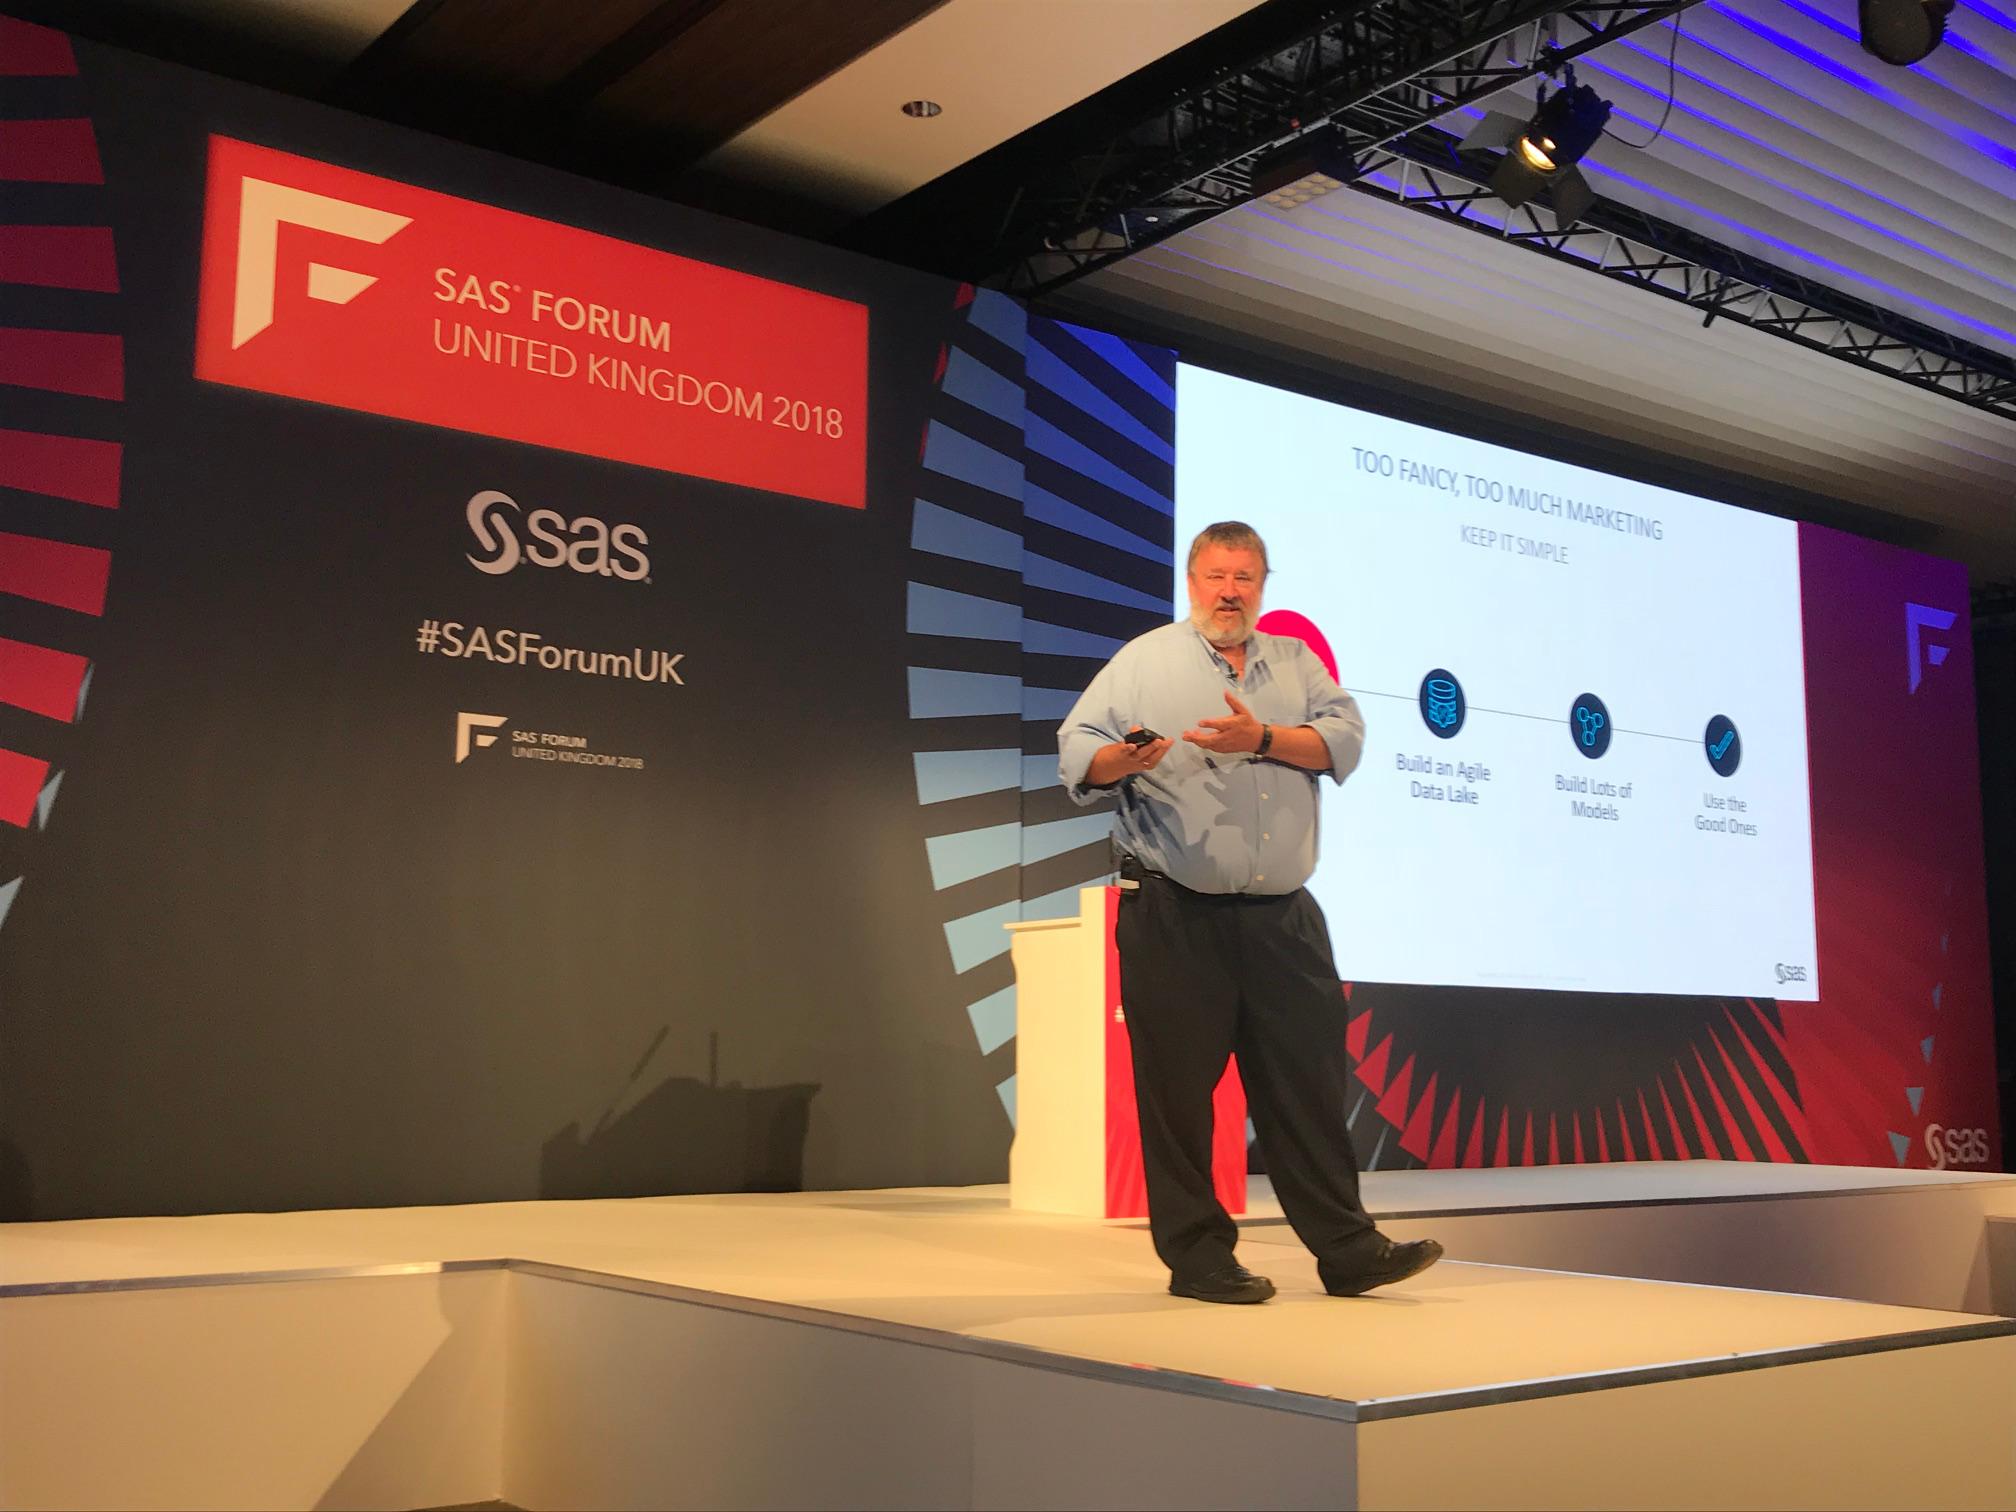 Paul Kent presents at SAS Forum UK